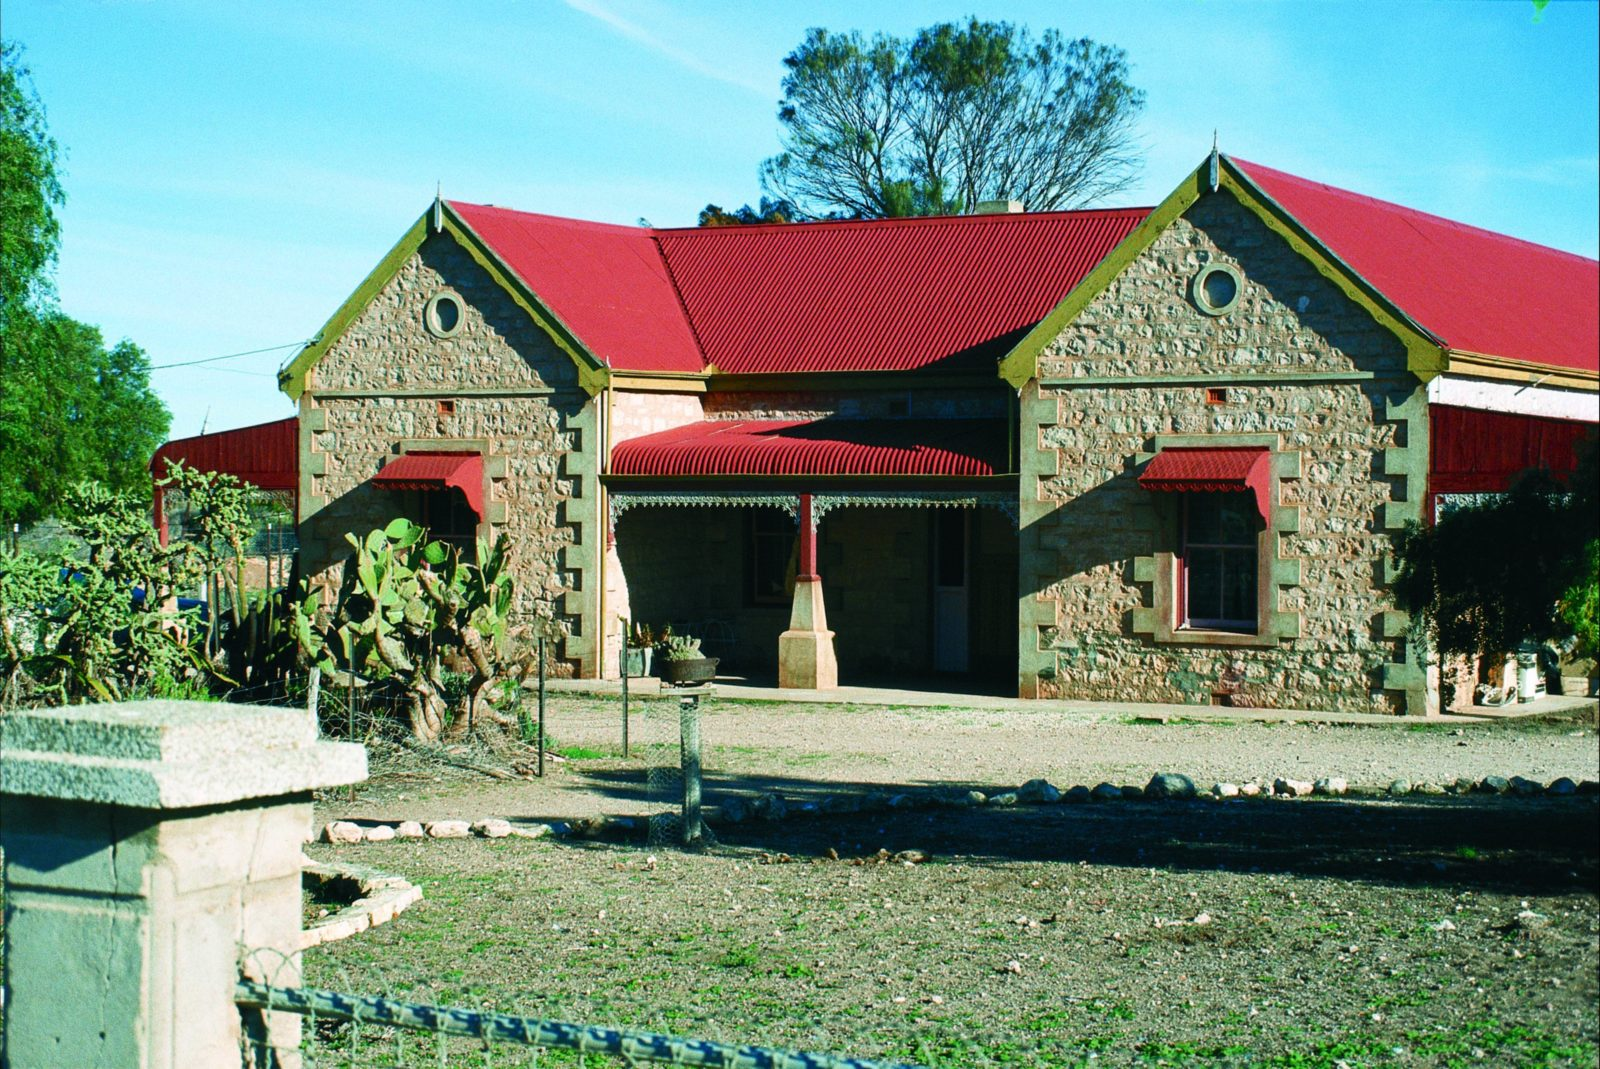 Balladonia, Western Australia